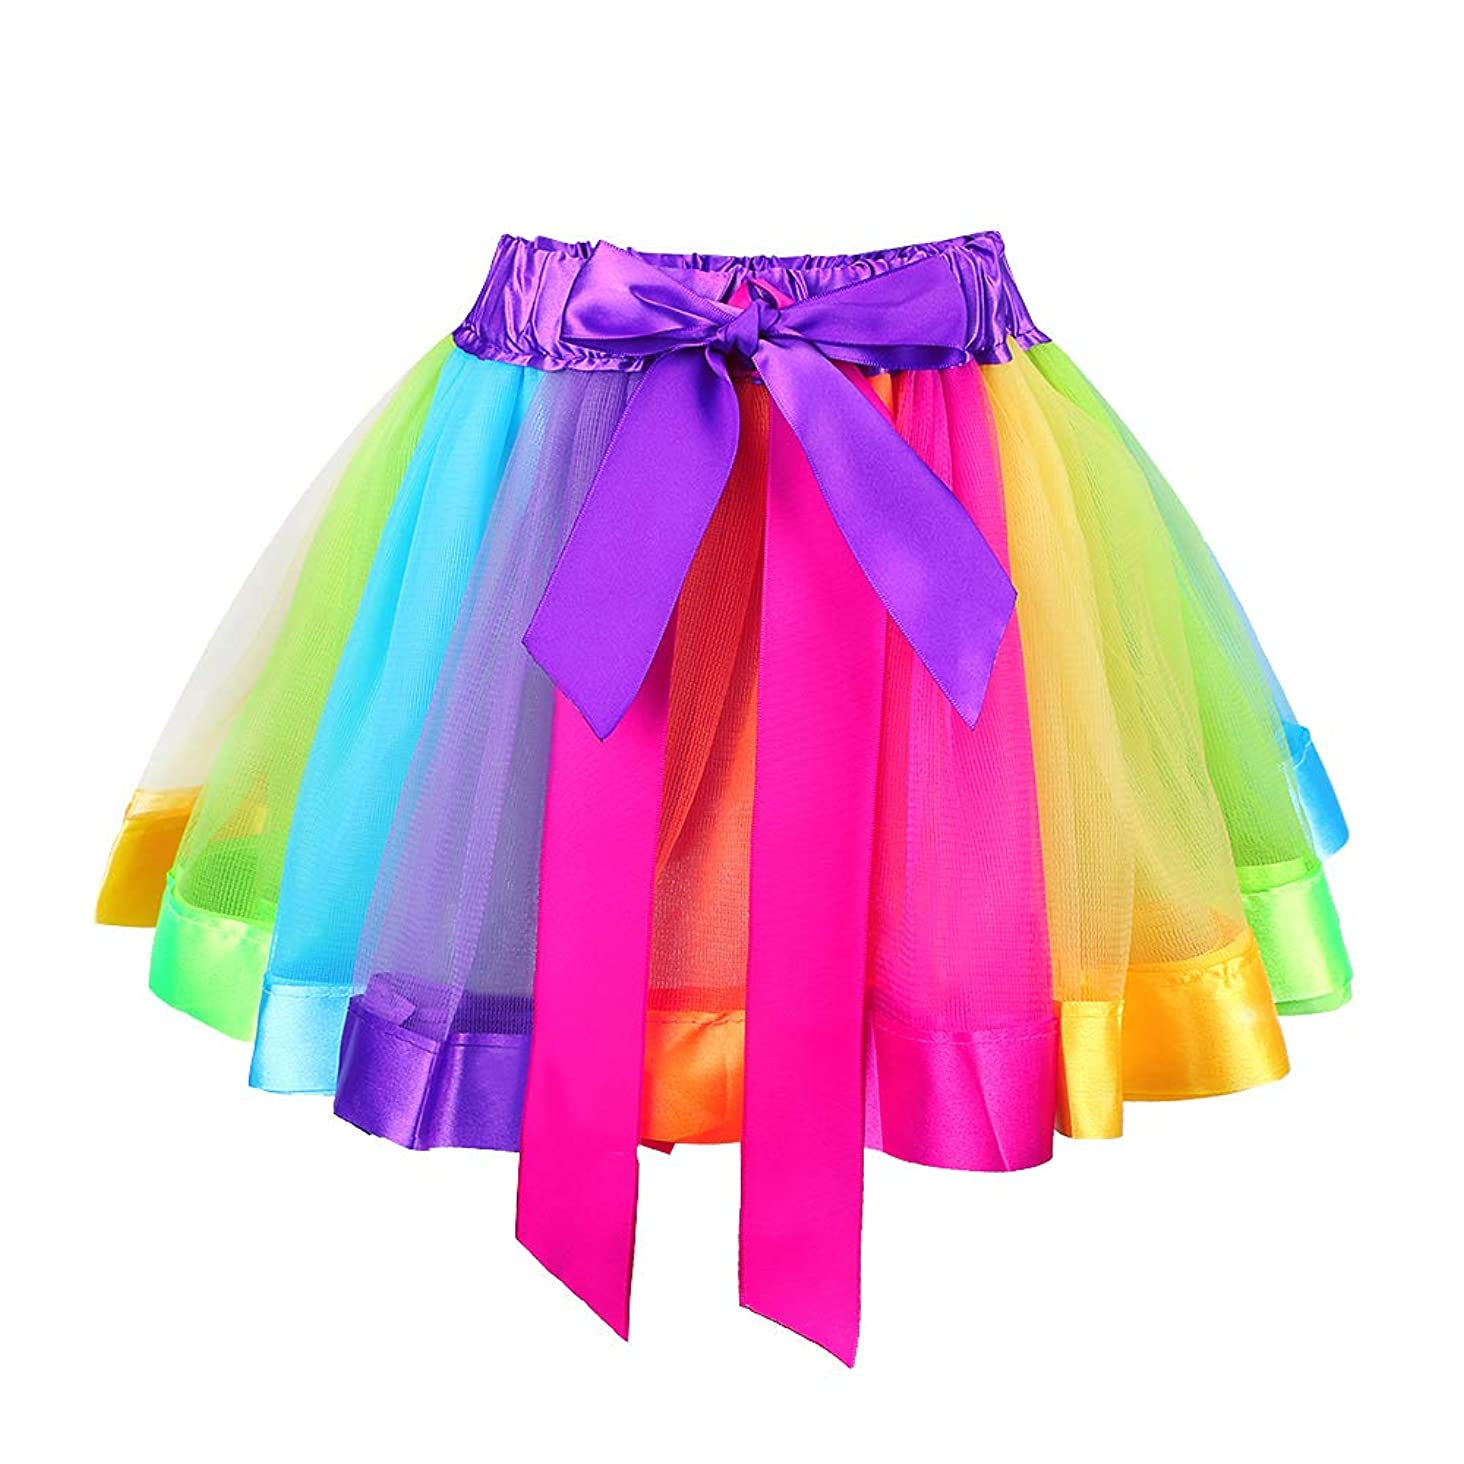 TFJH E Kids Baby Girls Fish Scale Stretch Ballet Dance Tutu Skirt Shorts Gymnastics Activewear 2-11Y